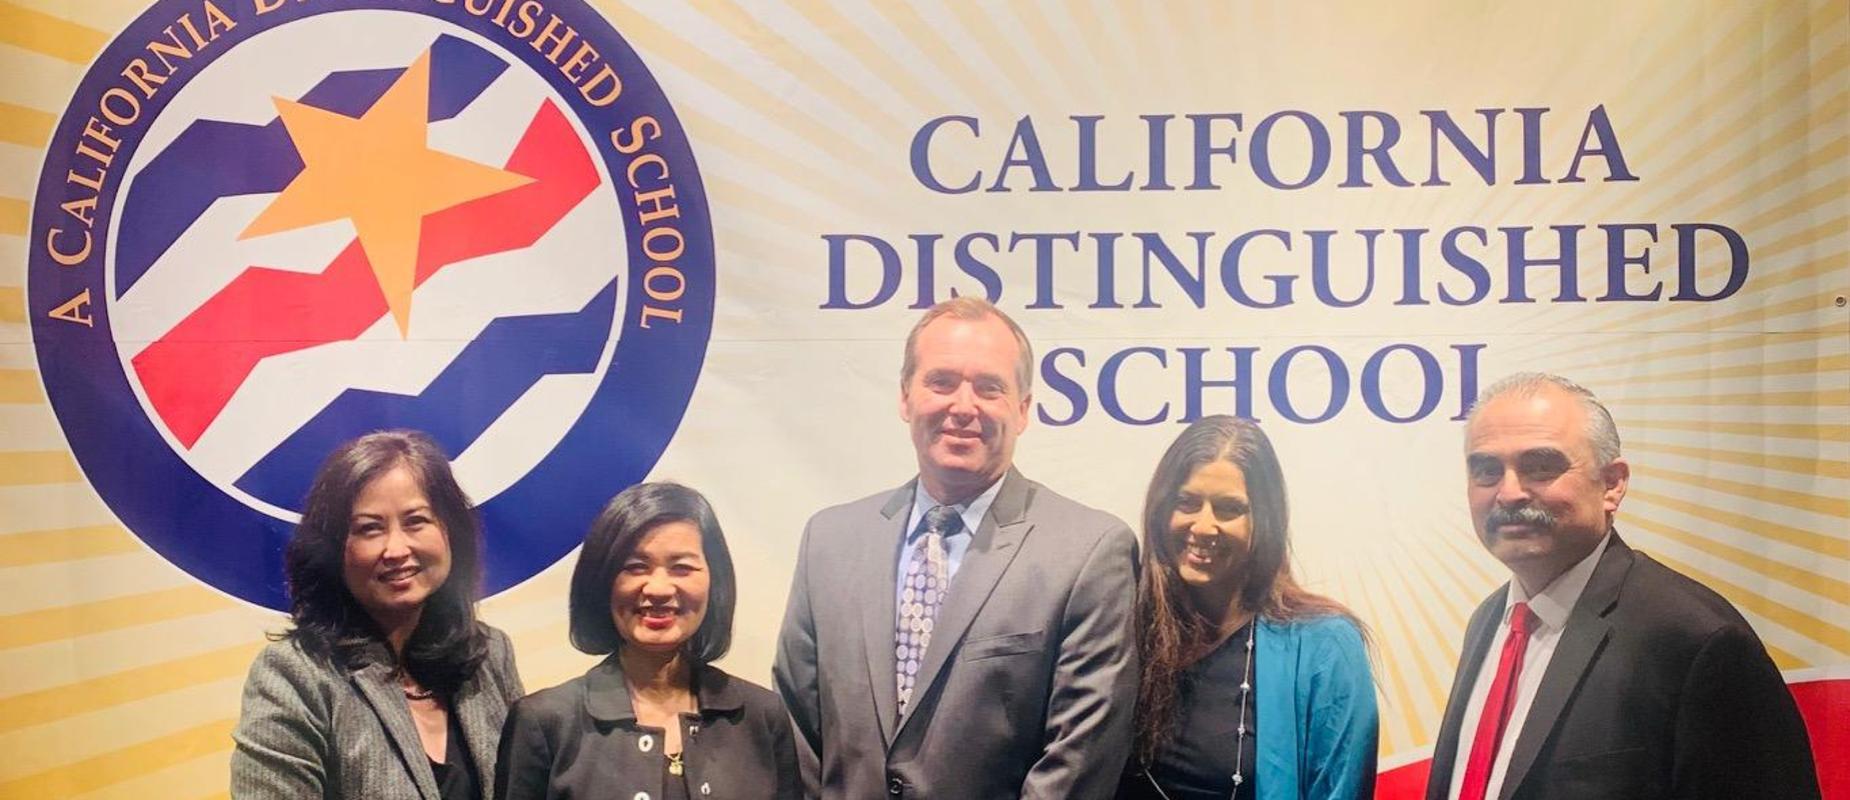 Congratulations to Hayden Elementary School for earning the prestigious Distinguished School Award!